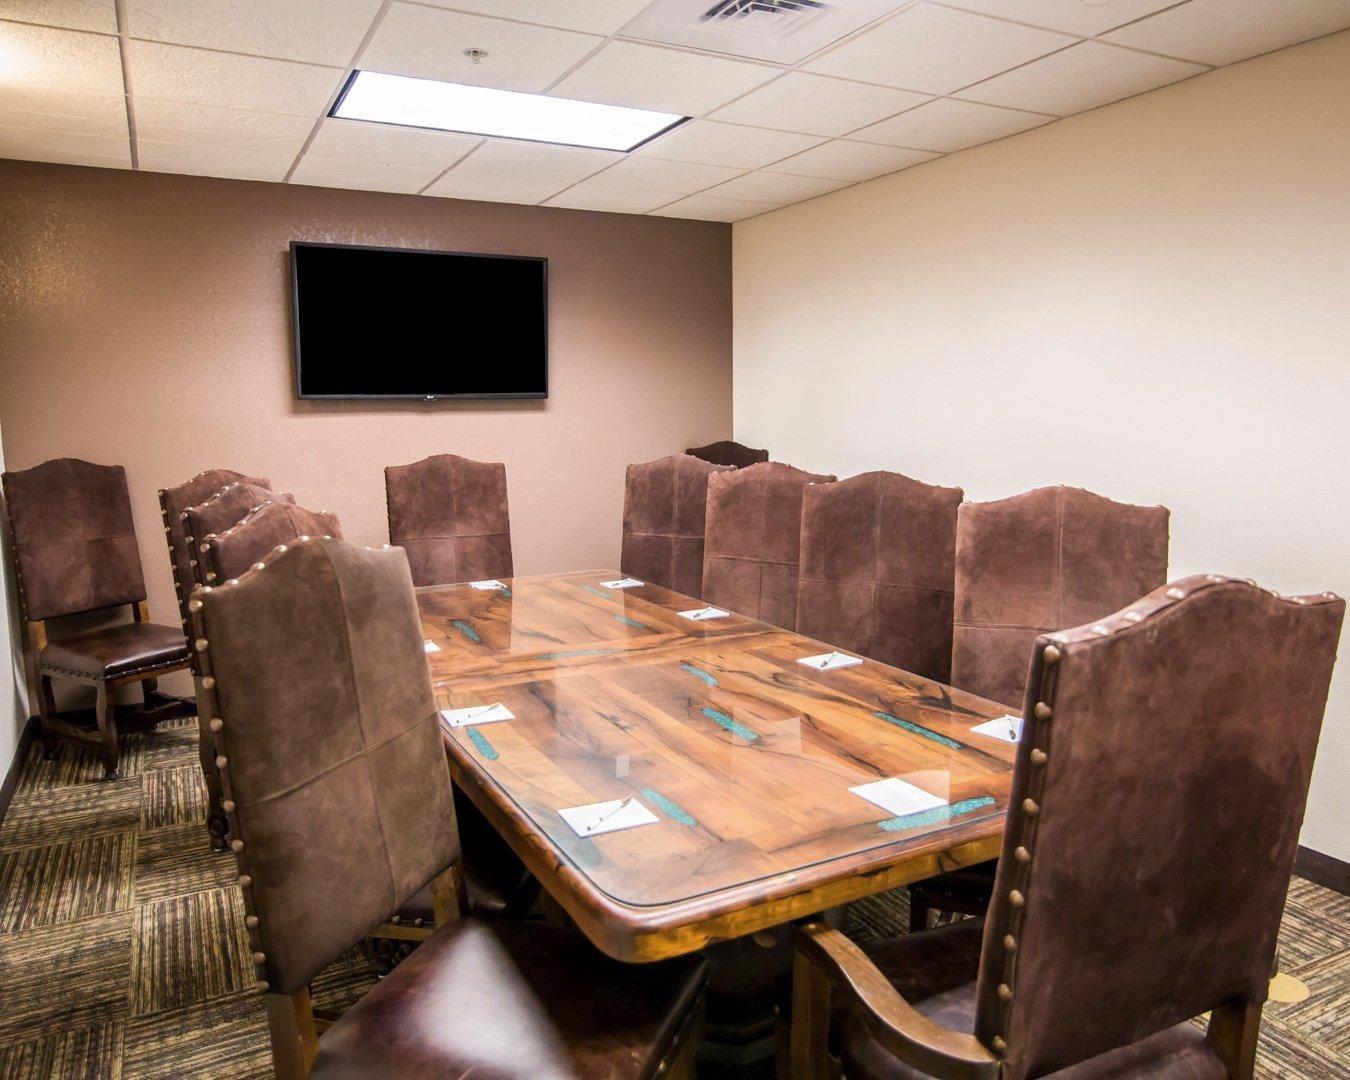 Sleep Inn & Suites & Conference Center, Garden City KS